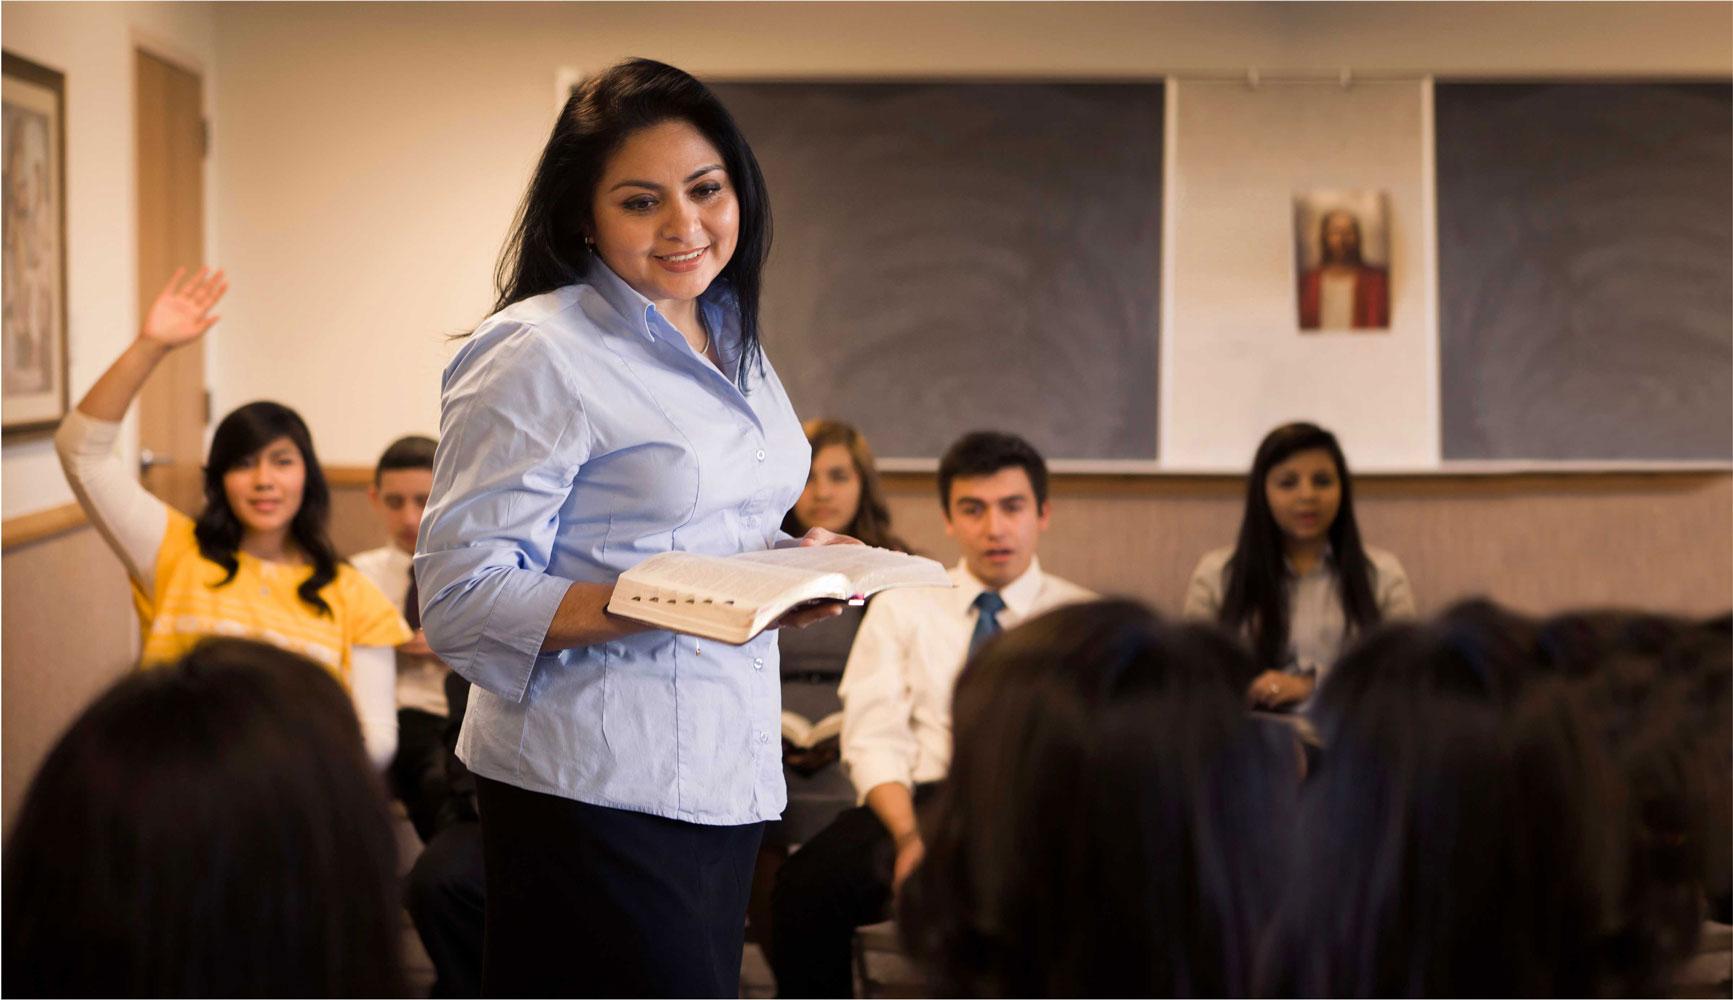 Teacher in a classroom